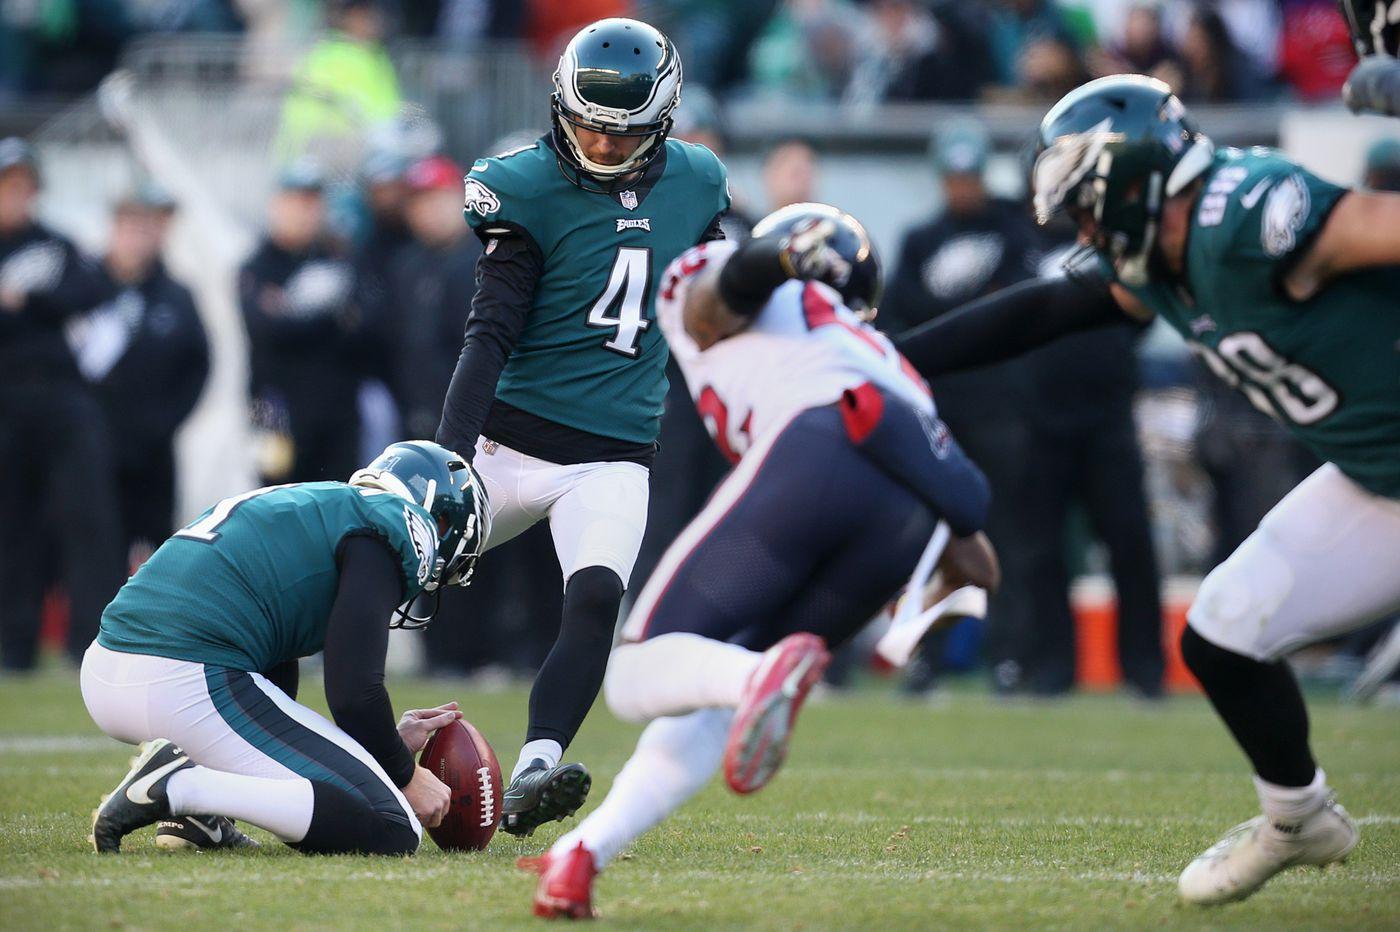 Jake Elliott's clutch kicking helping Eagles keep season alive